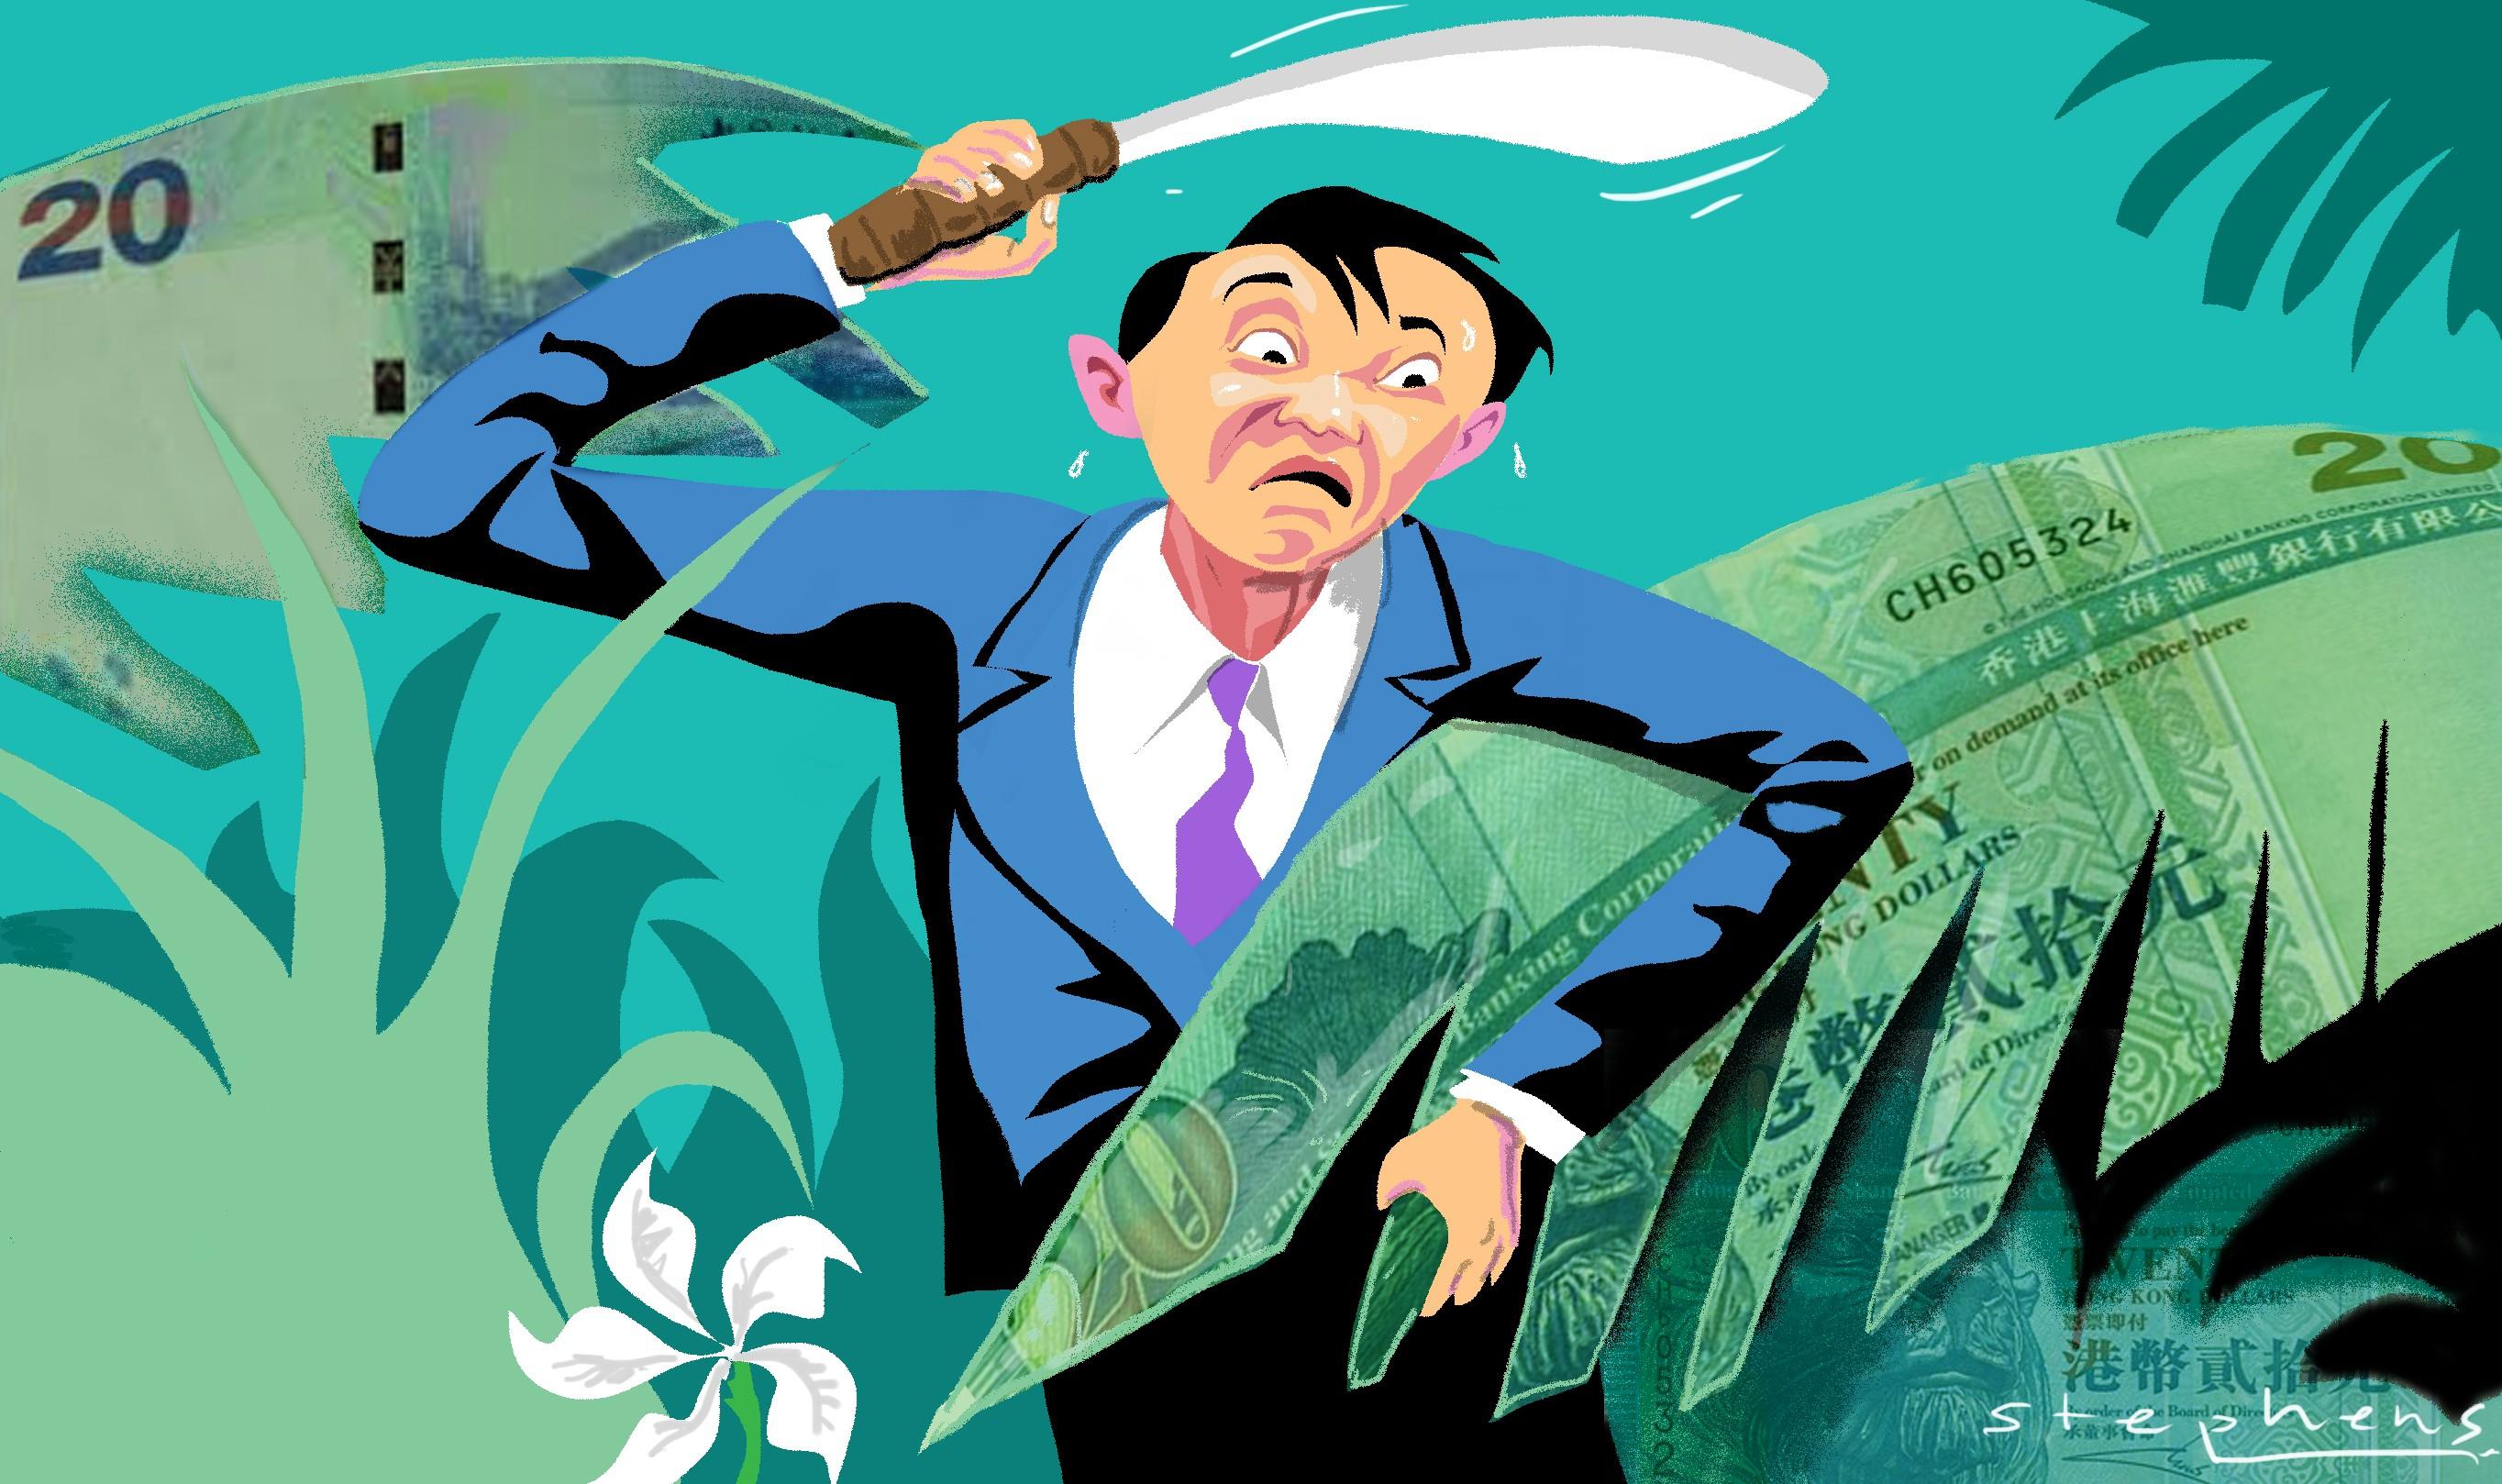 Hong Kong needs radical social and economic reform  Let's